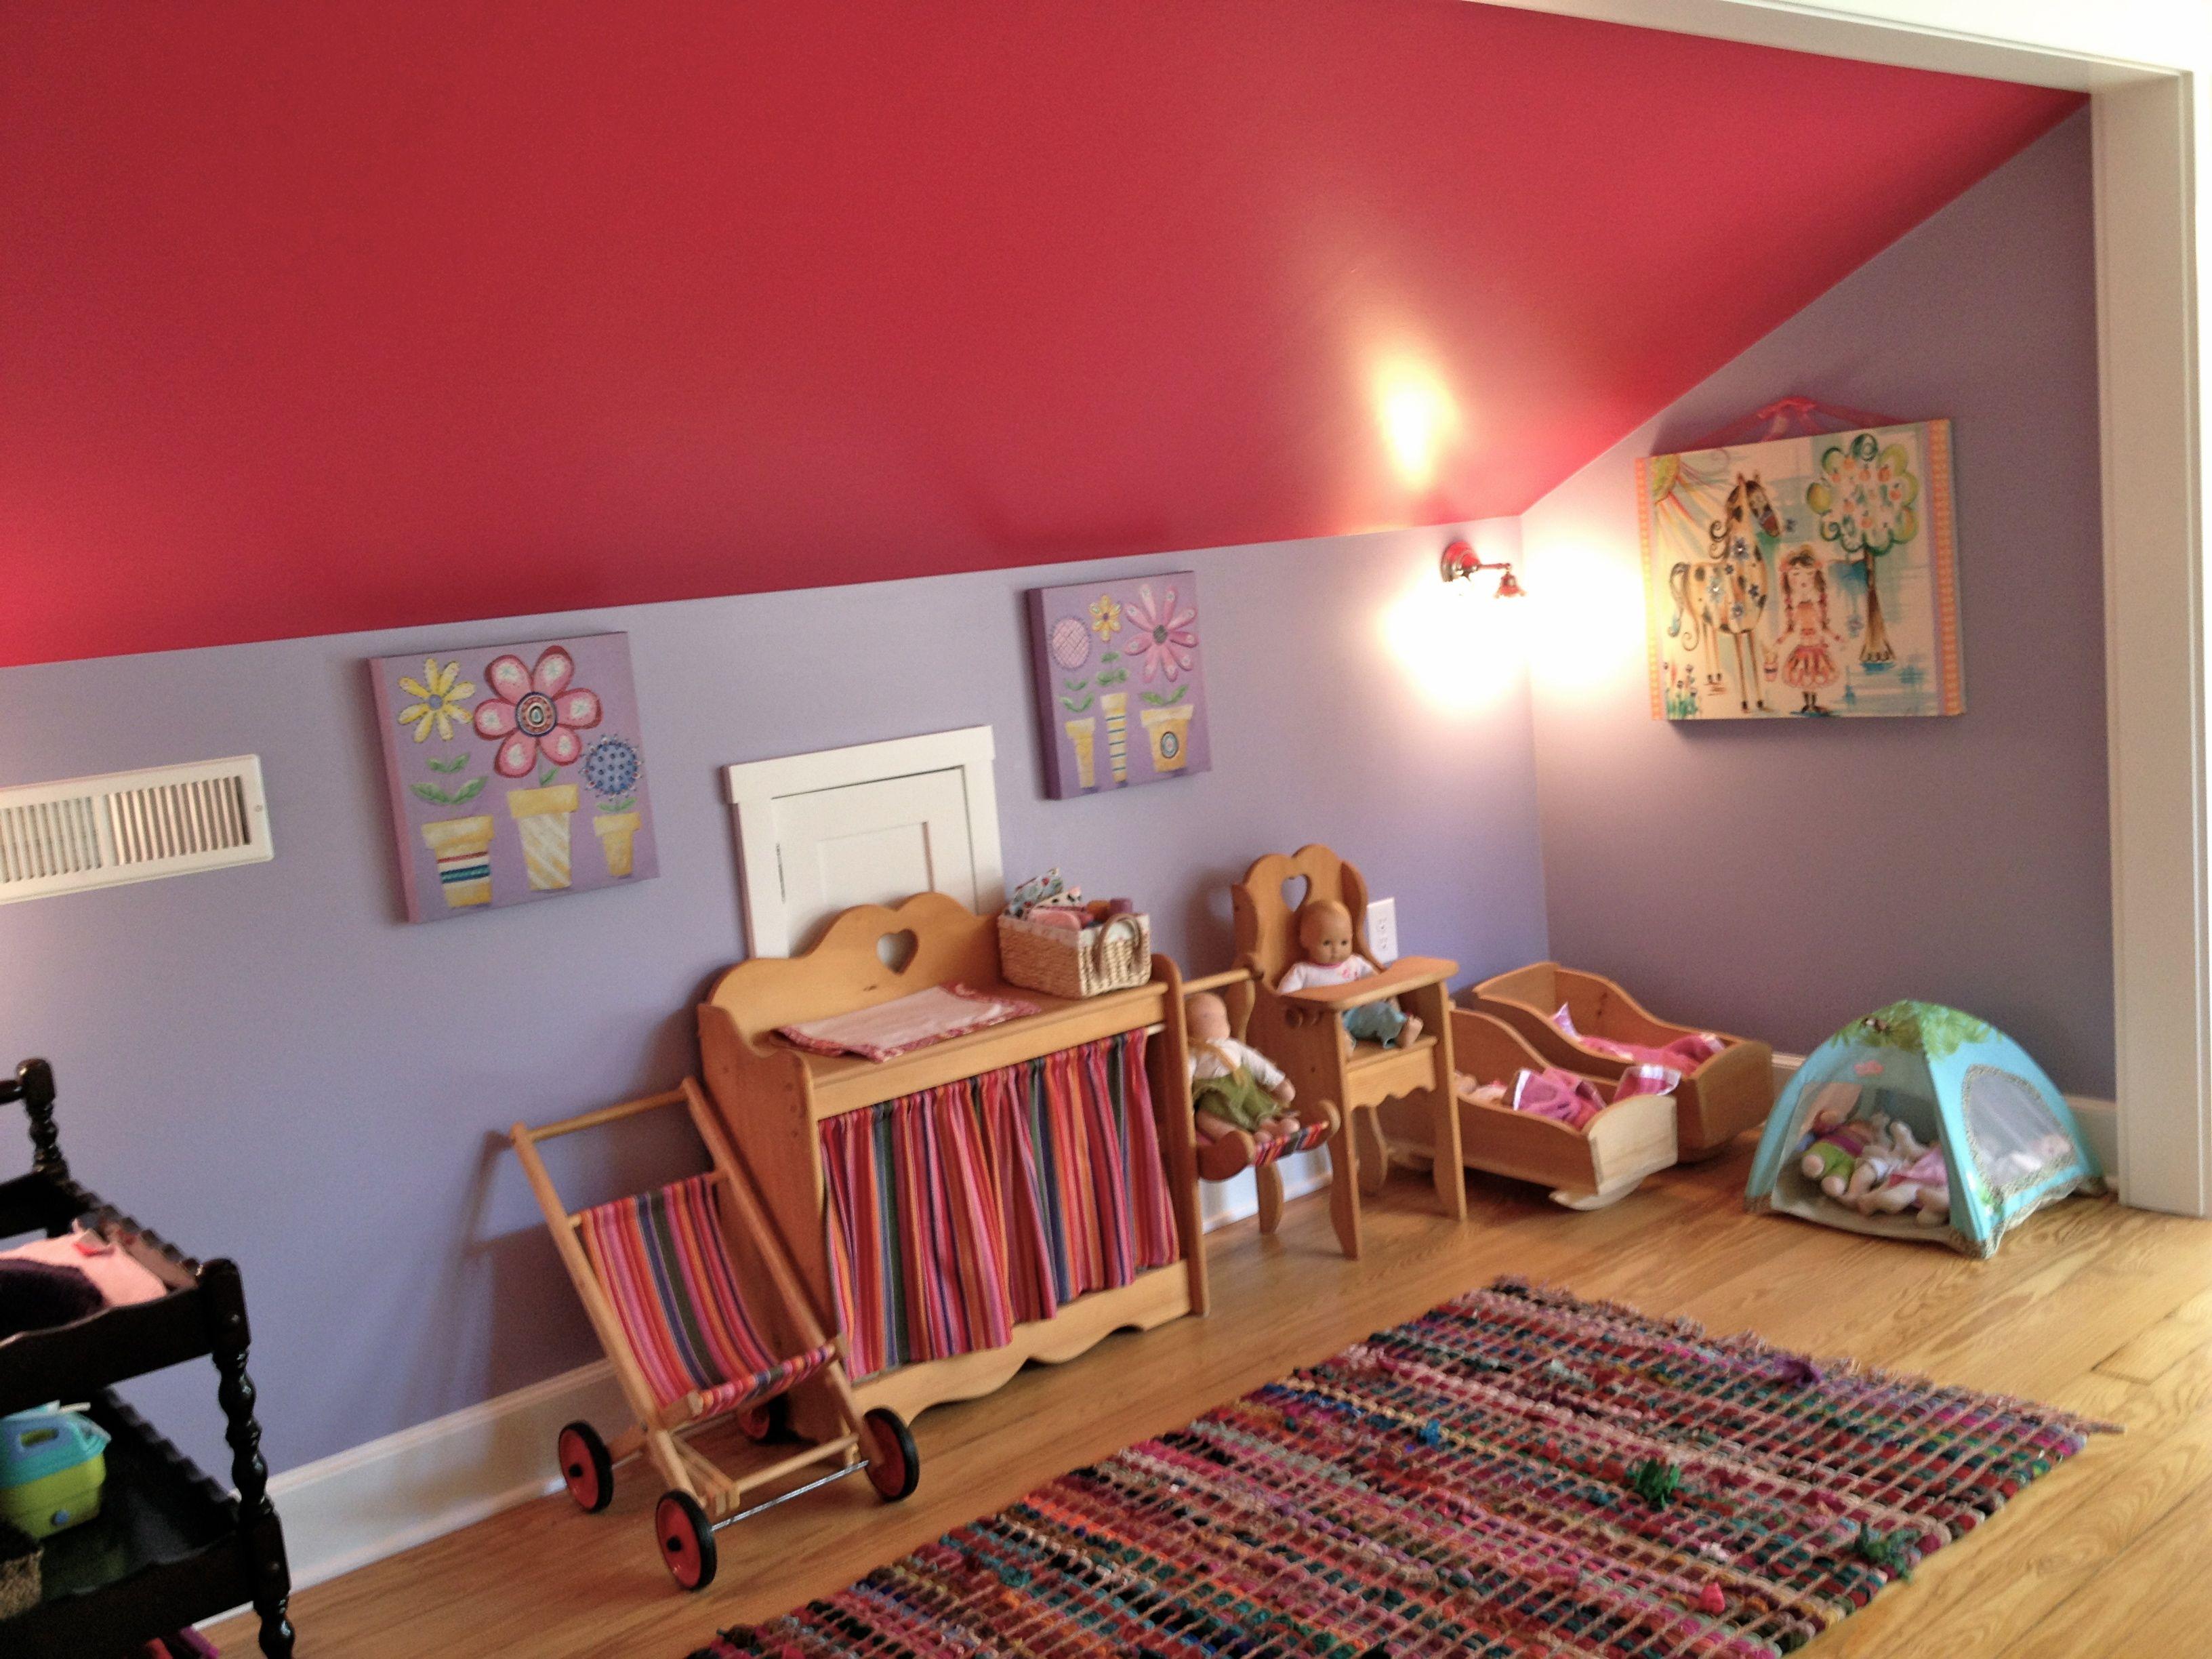 baby play corner - Google Search | Interior Design | Pinterest ...